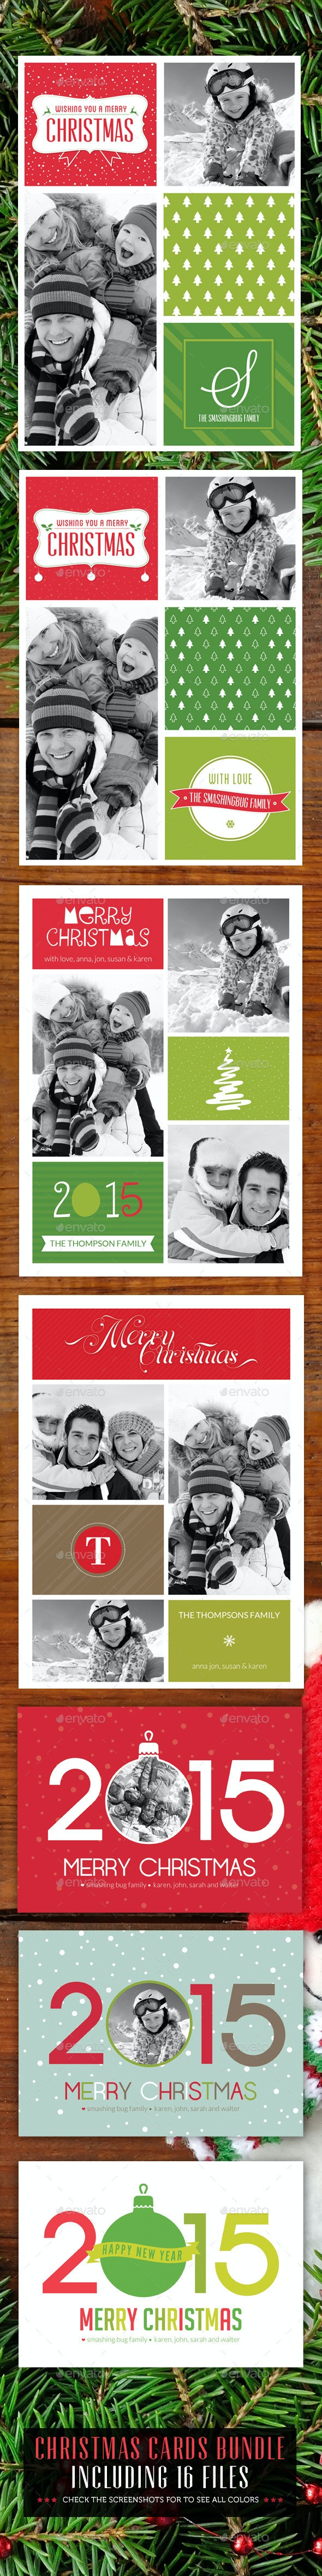 Christmas Cards Bunle v1 - Holiday Greeting Cards